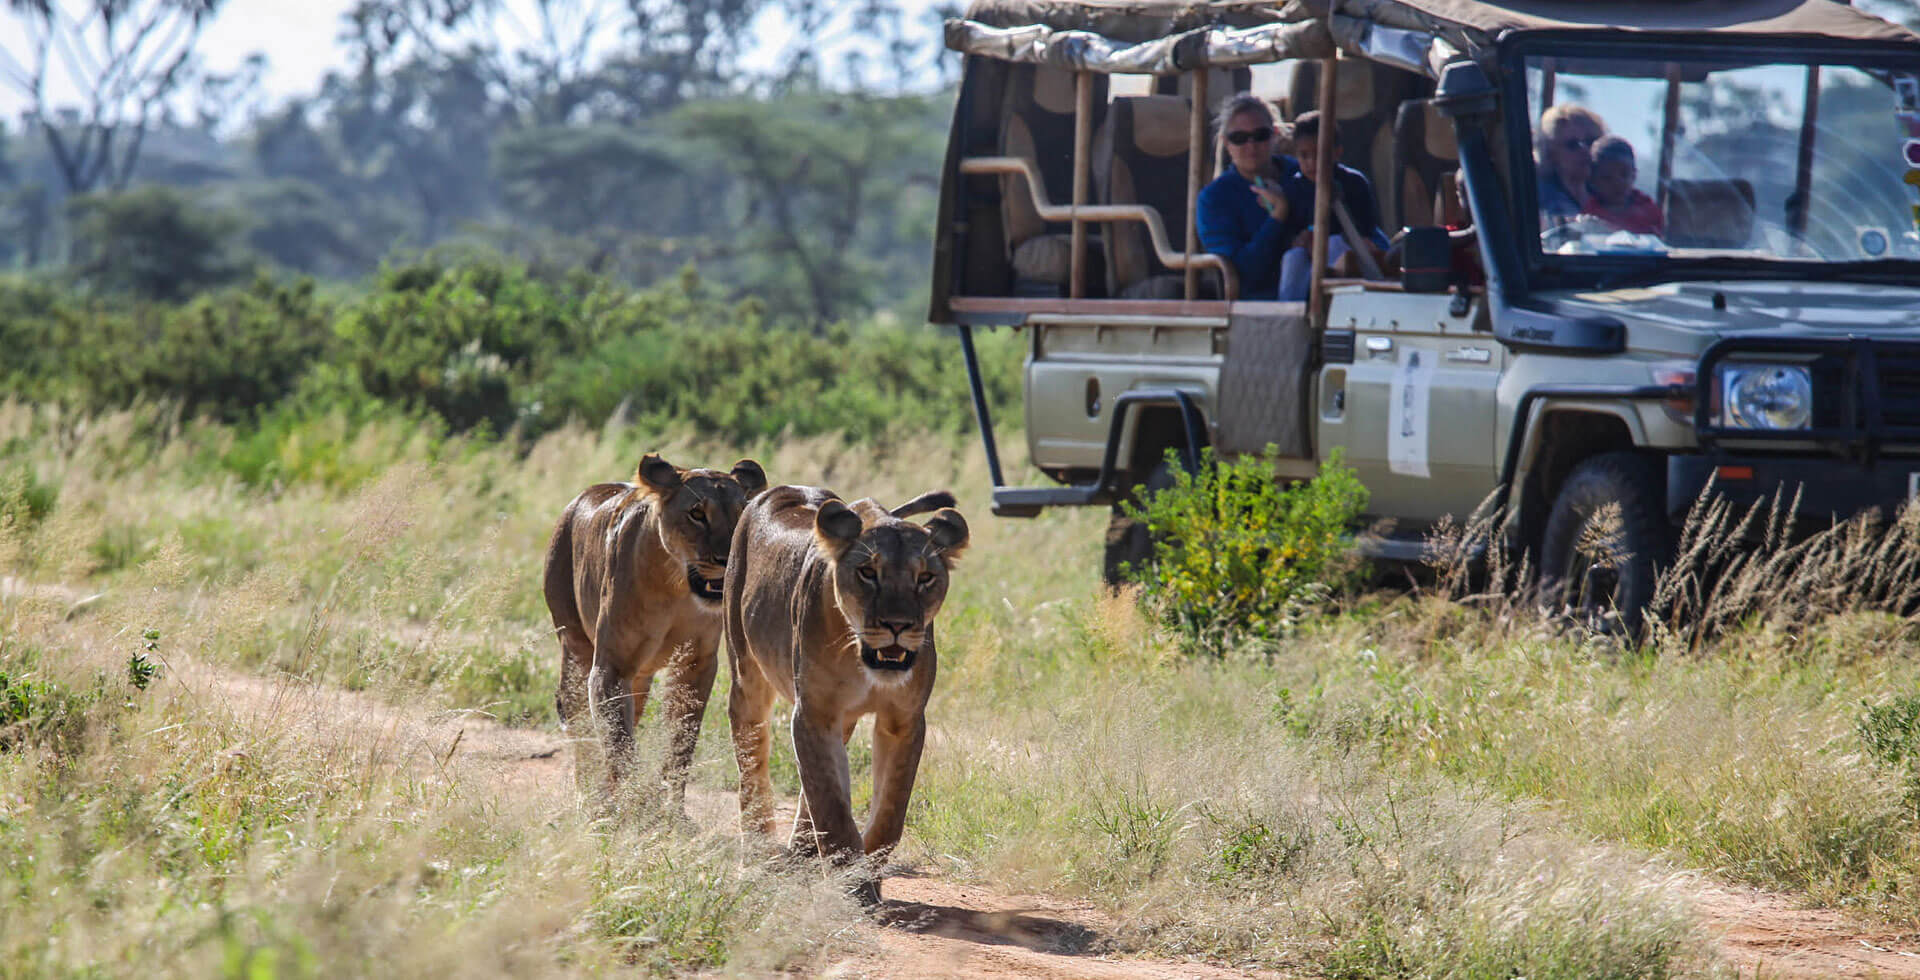 tanzania safari tours, tanzania tours, tanzania safari